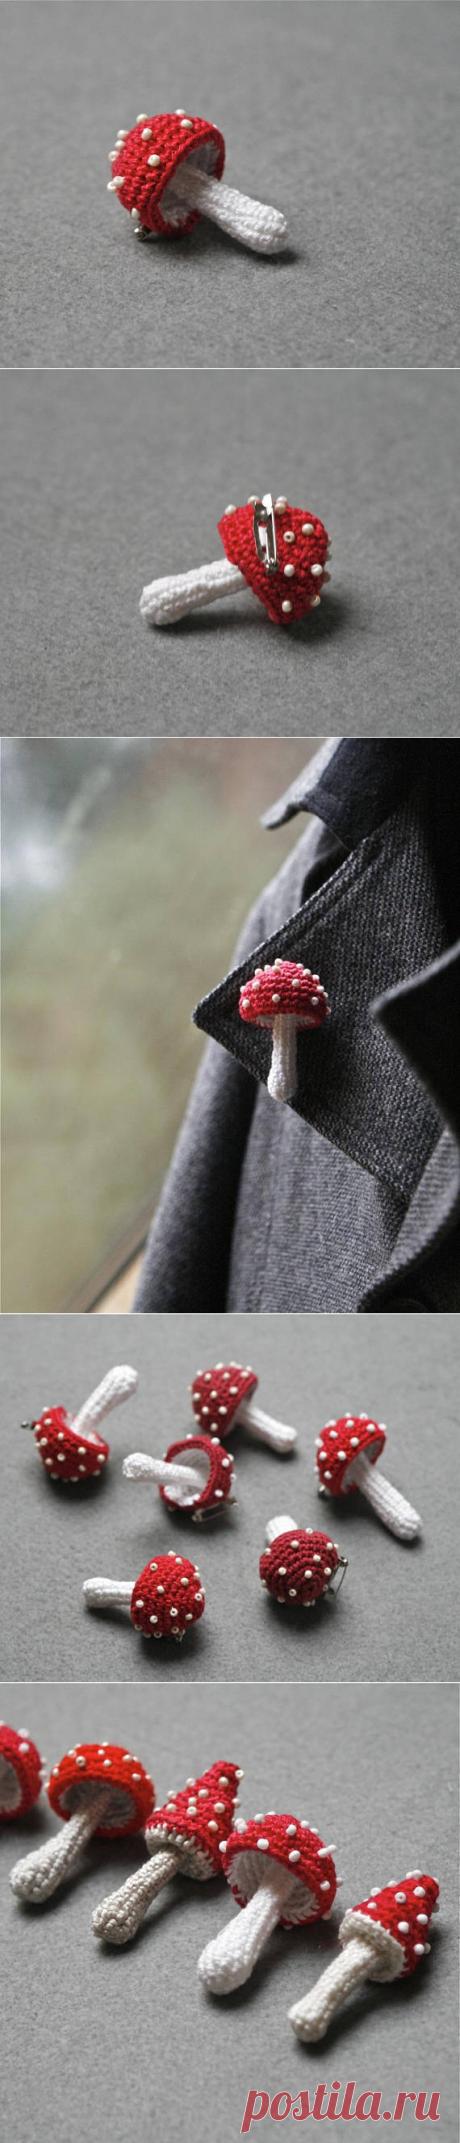 Toadstool pin crochet mushroom brooch woodland jewelry